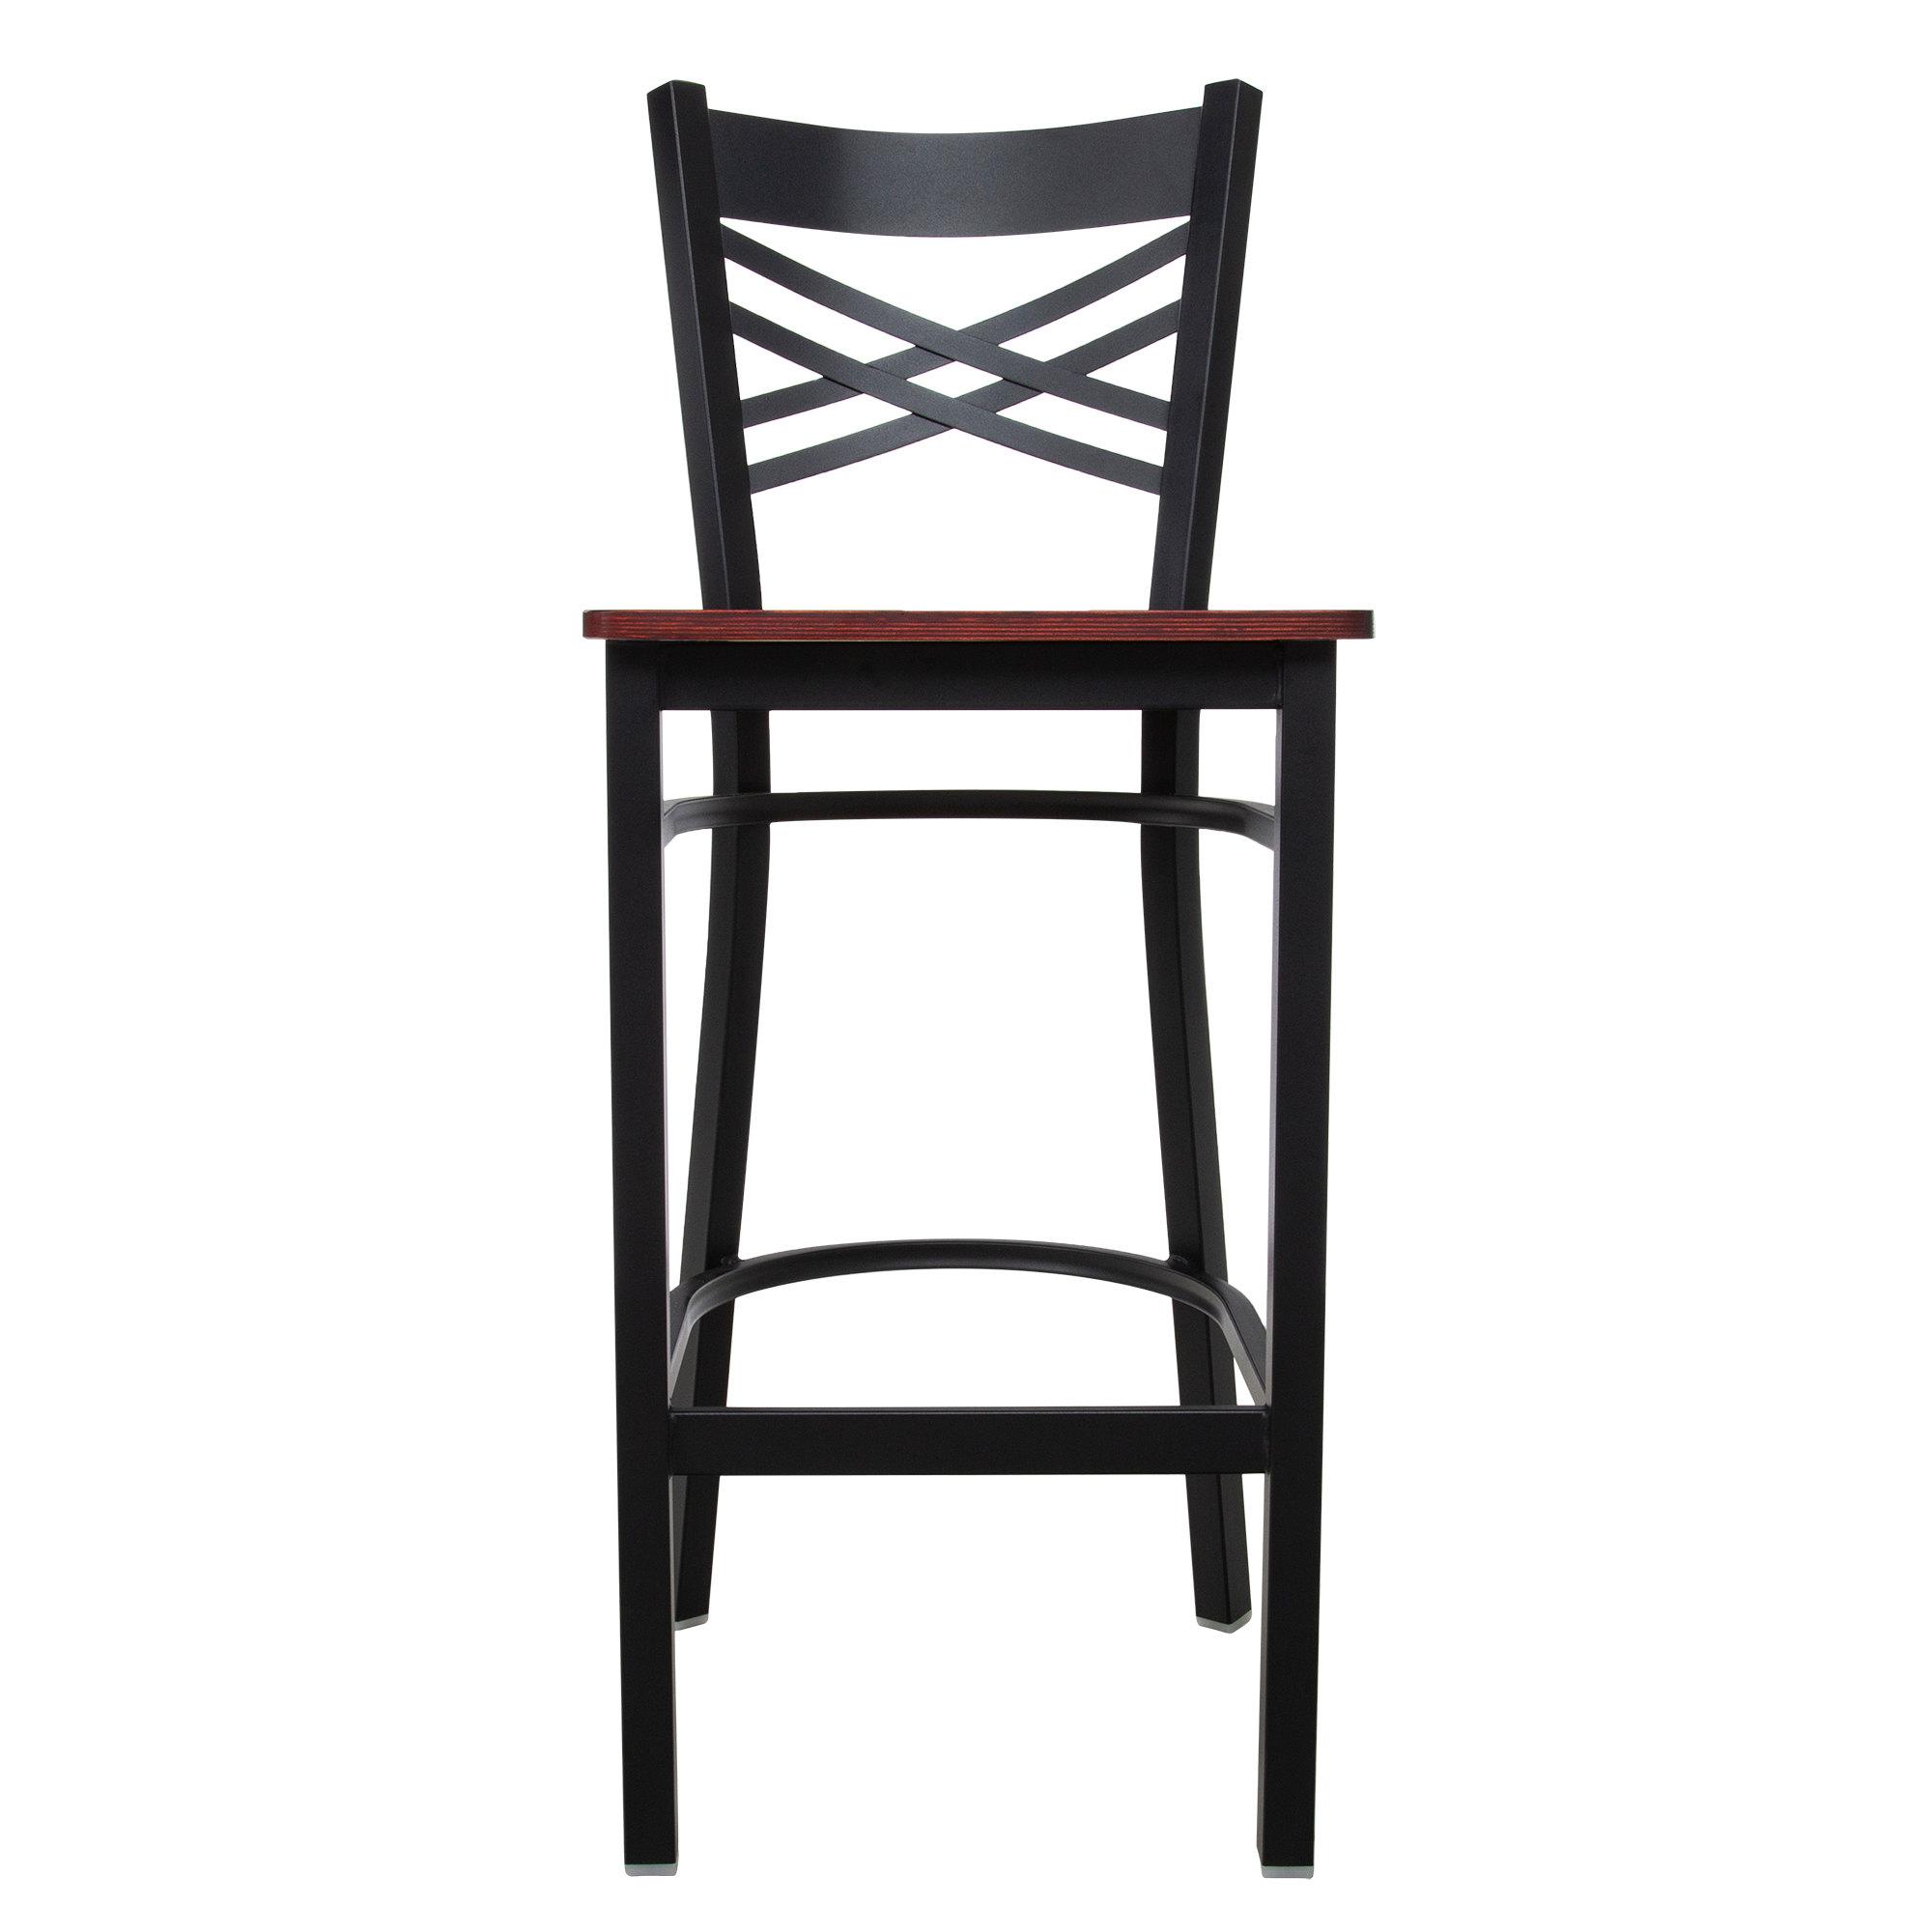 #199 - Black Metal Cross Back Restaurant Barstool with Mahogany Wood Seat